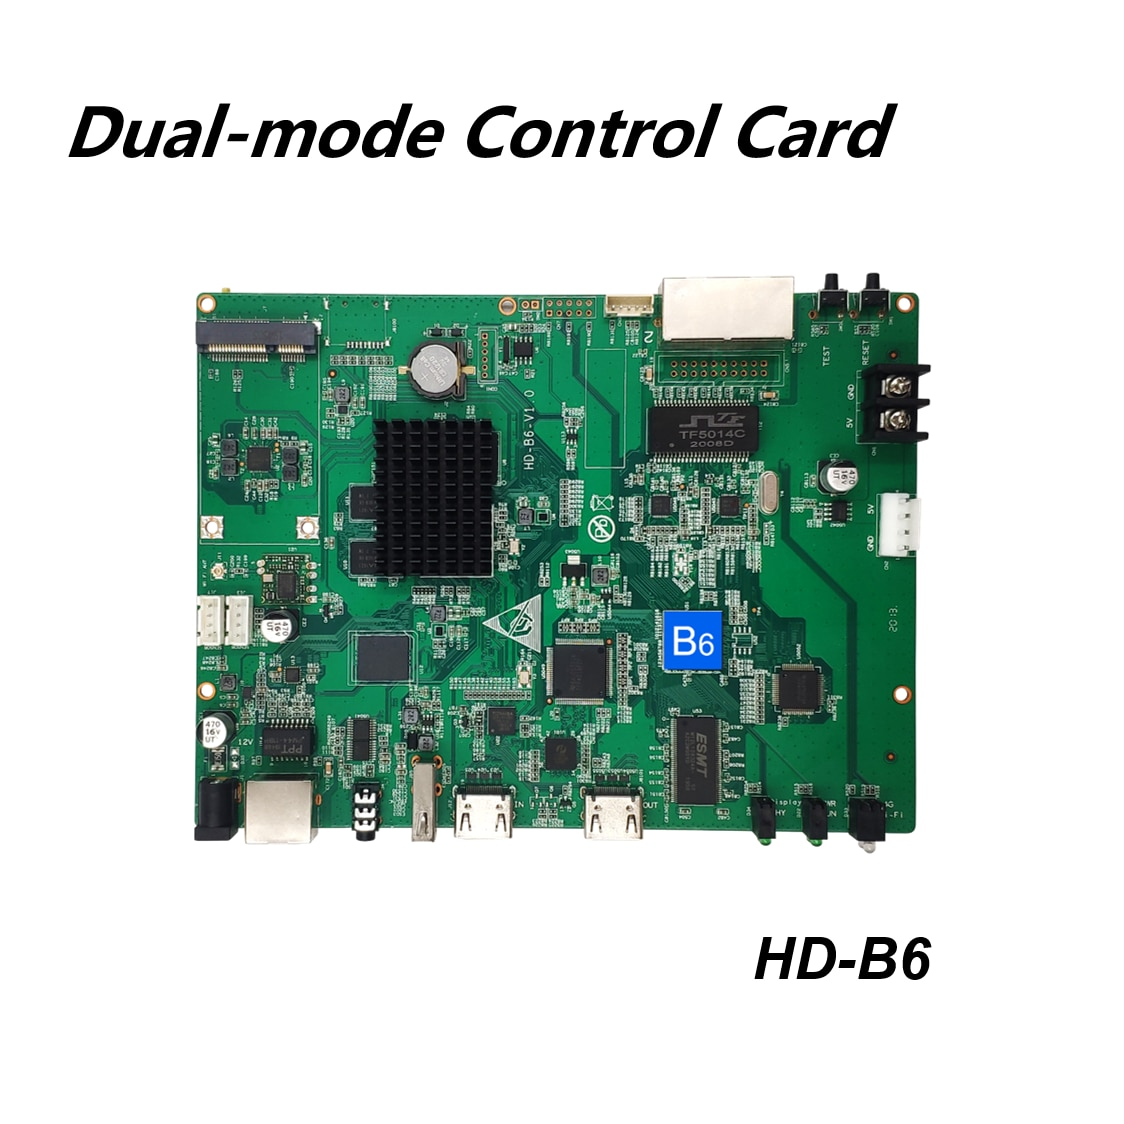 Huidu المزدوج وضع LED بطاقة التحكم HD-B6 لوحدة شاشة led